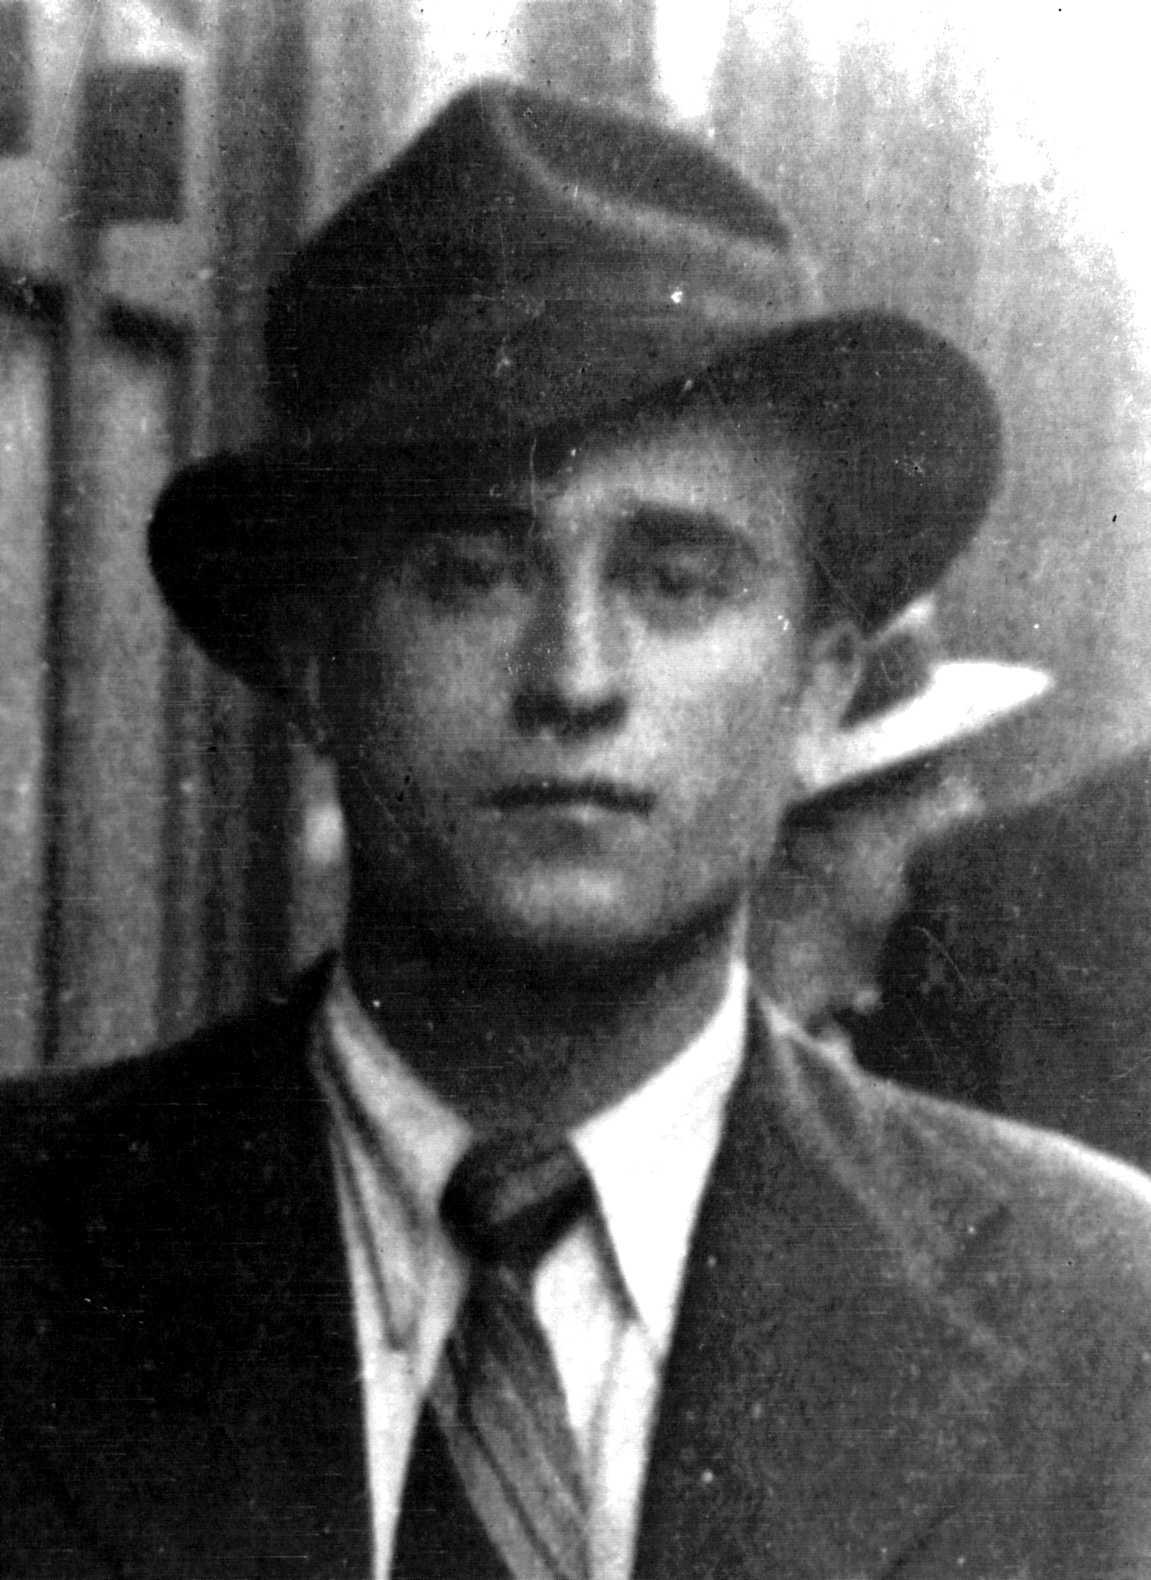 Ramon González Sanmartí